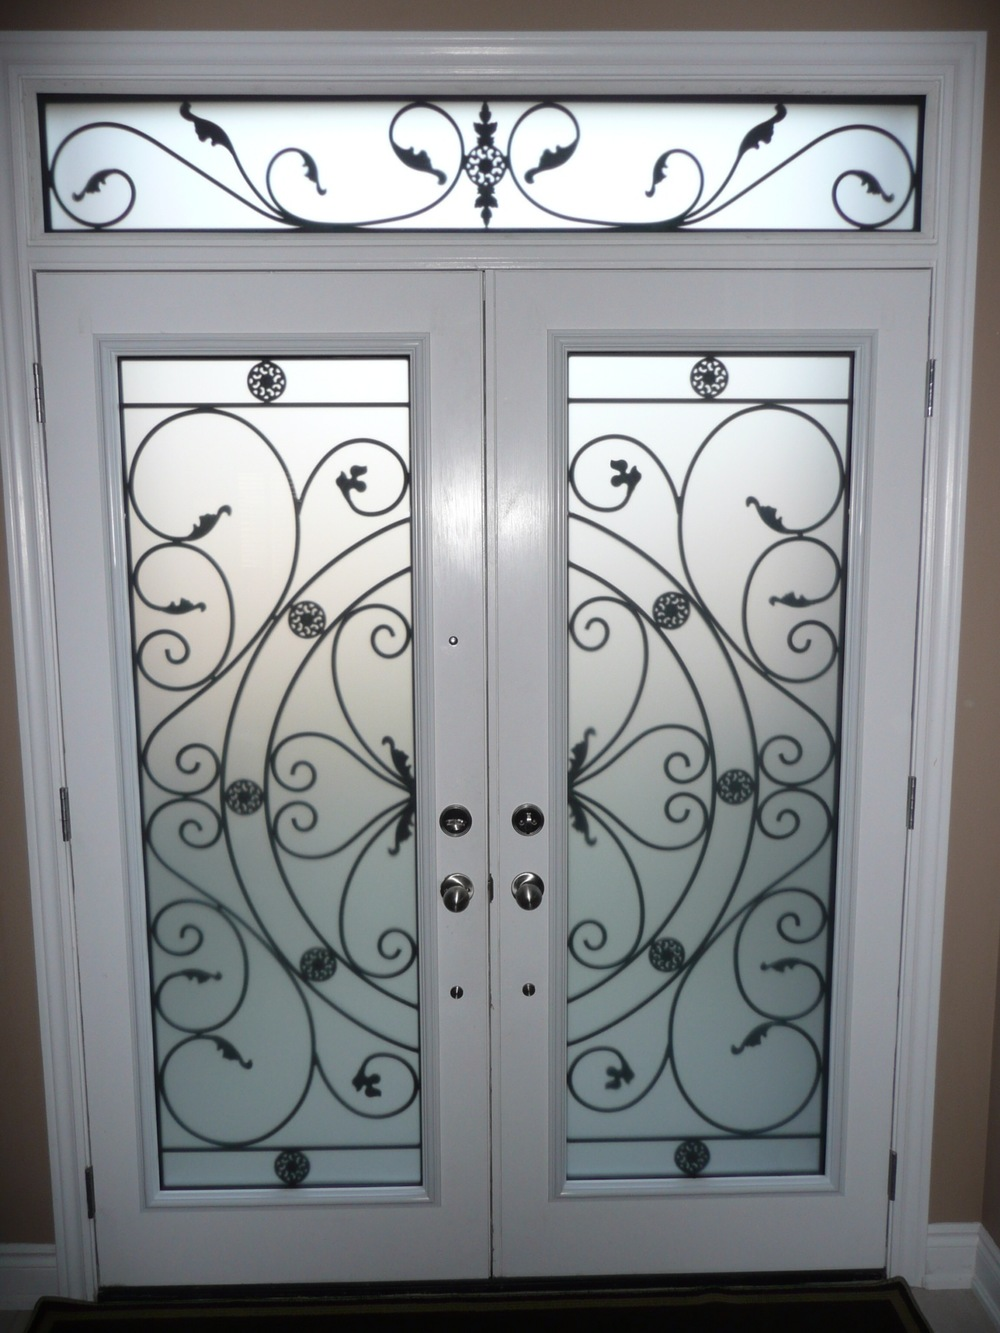 Campbellsford-Wrought-Iron-Glass-Door-Inserts-Brampton-Ontario